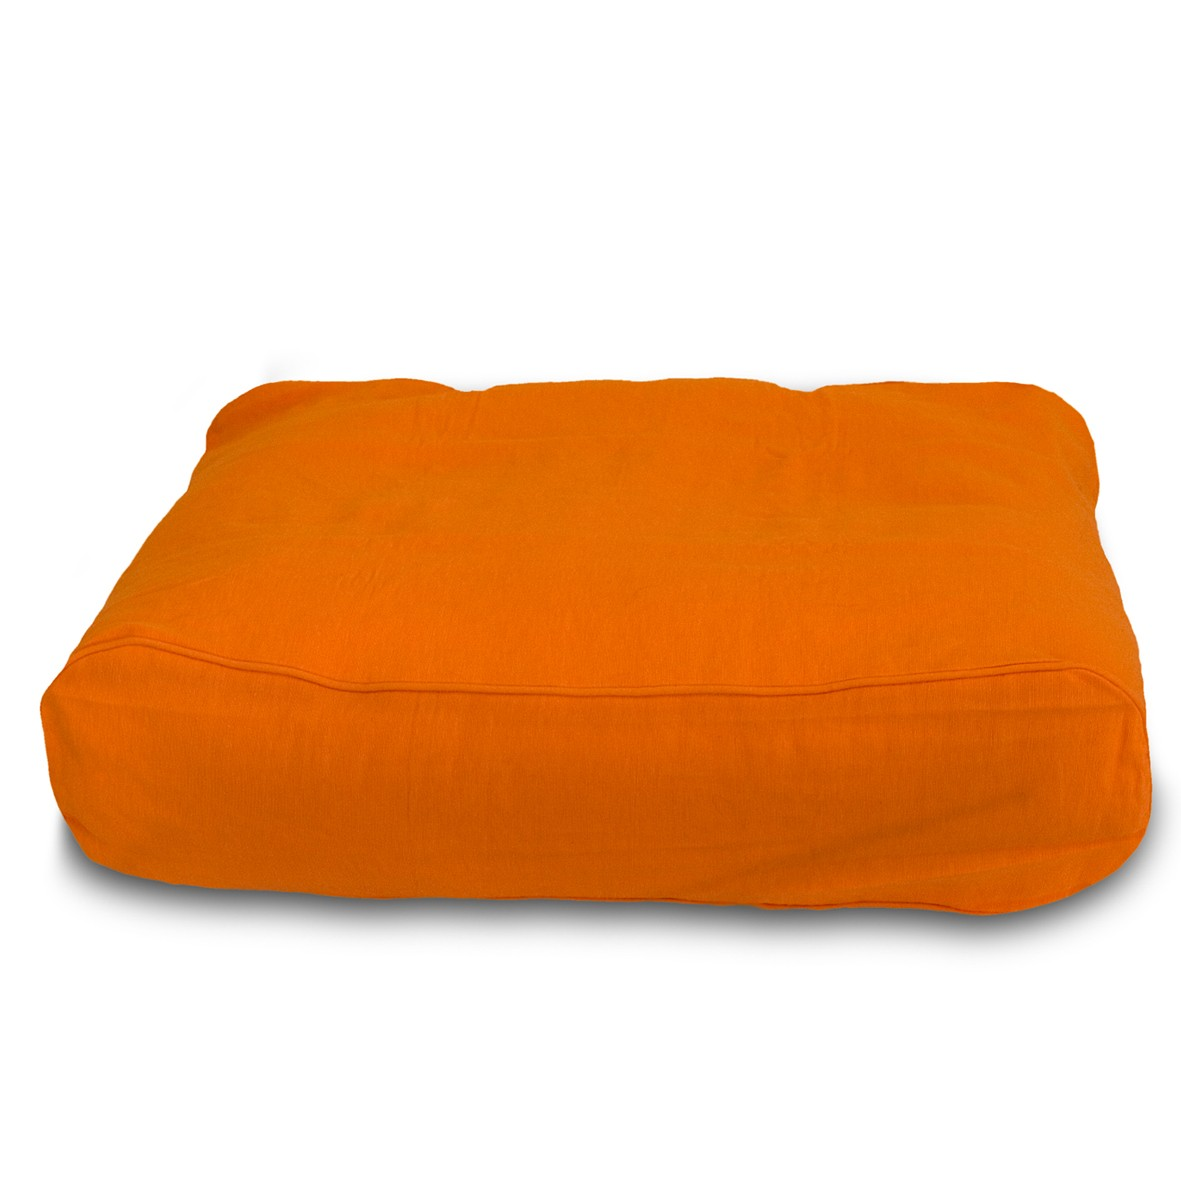 Levně Lex & Max Luxusní potah na pelech pro psa Lex & Max Professional 120 x 80 cm   oranžový